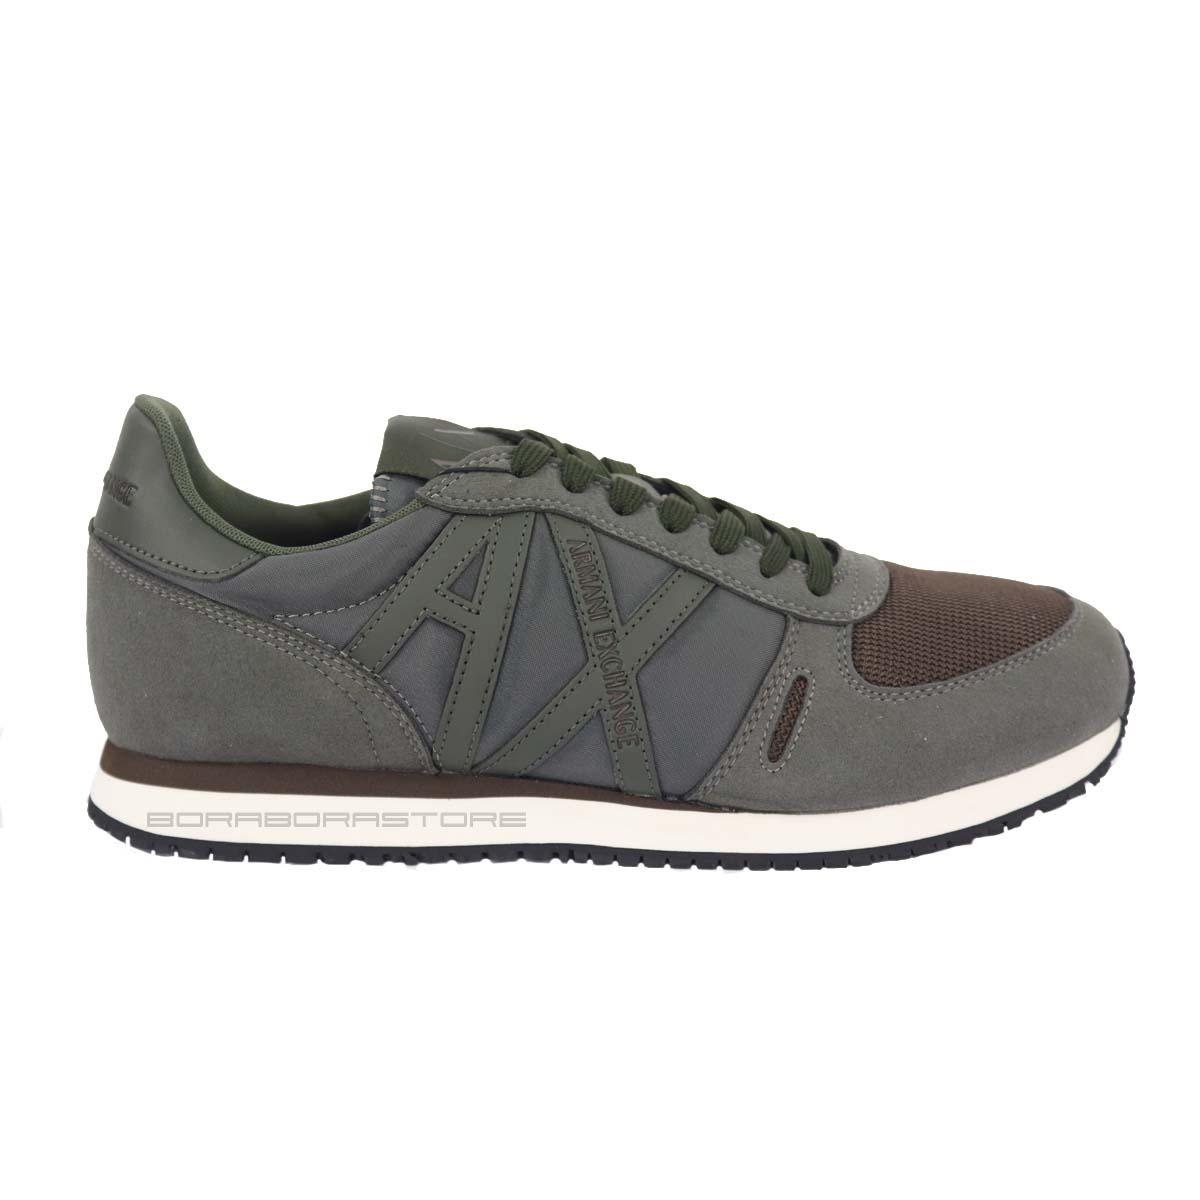 Armani Exchange Scarpe uomo scarpe da ginnastica mod. XUX017